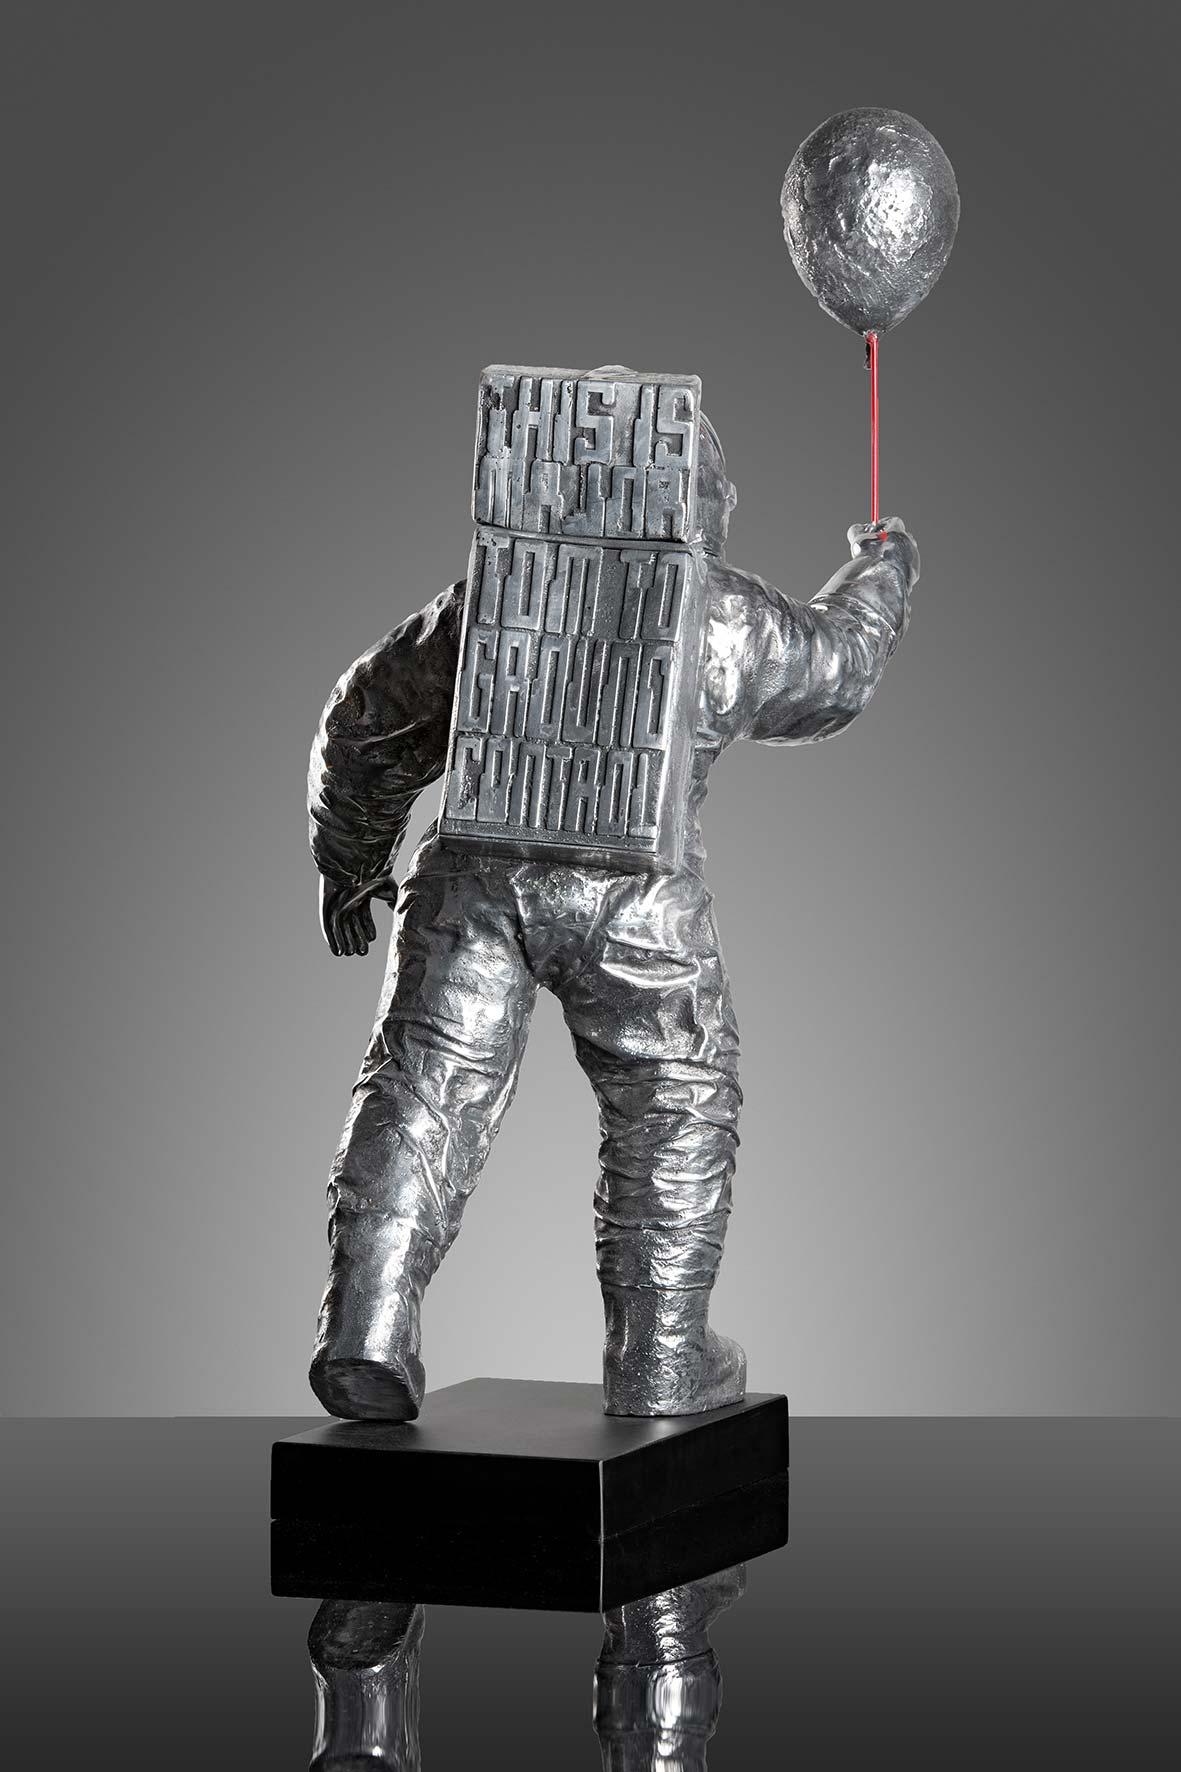 Major Tom  (2015) | aluminium | 80 x 25 x 37 cm |oeuvre originale | © Jean-René broyer